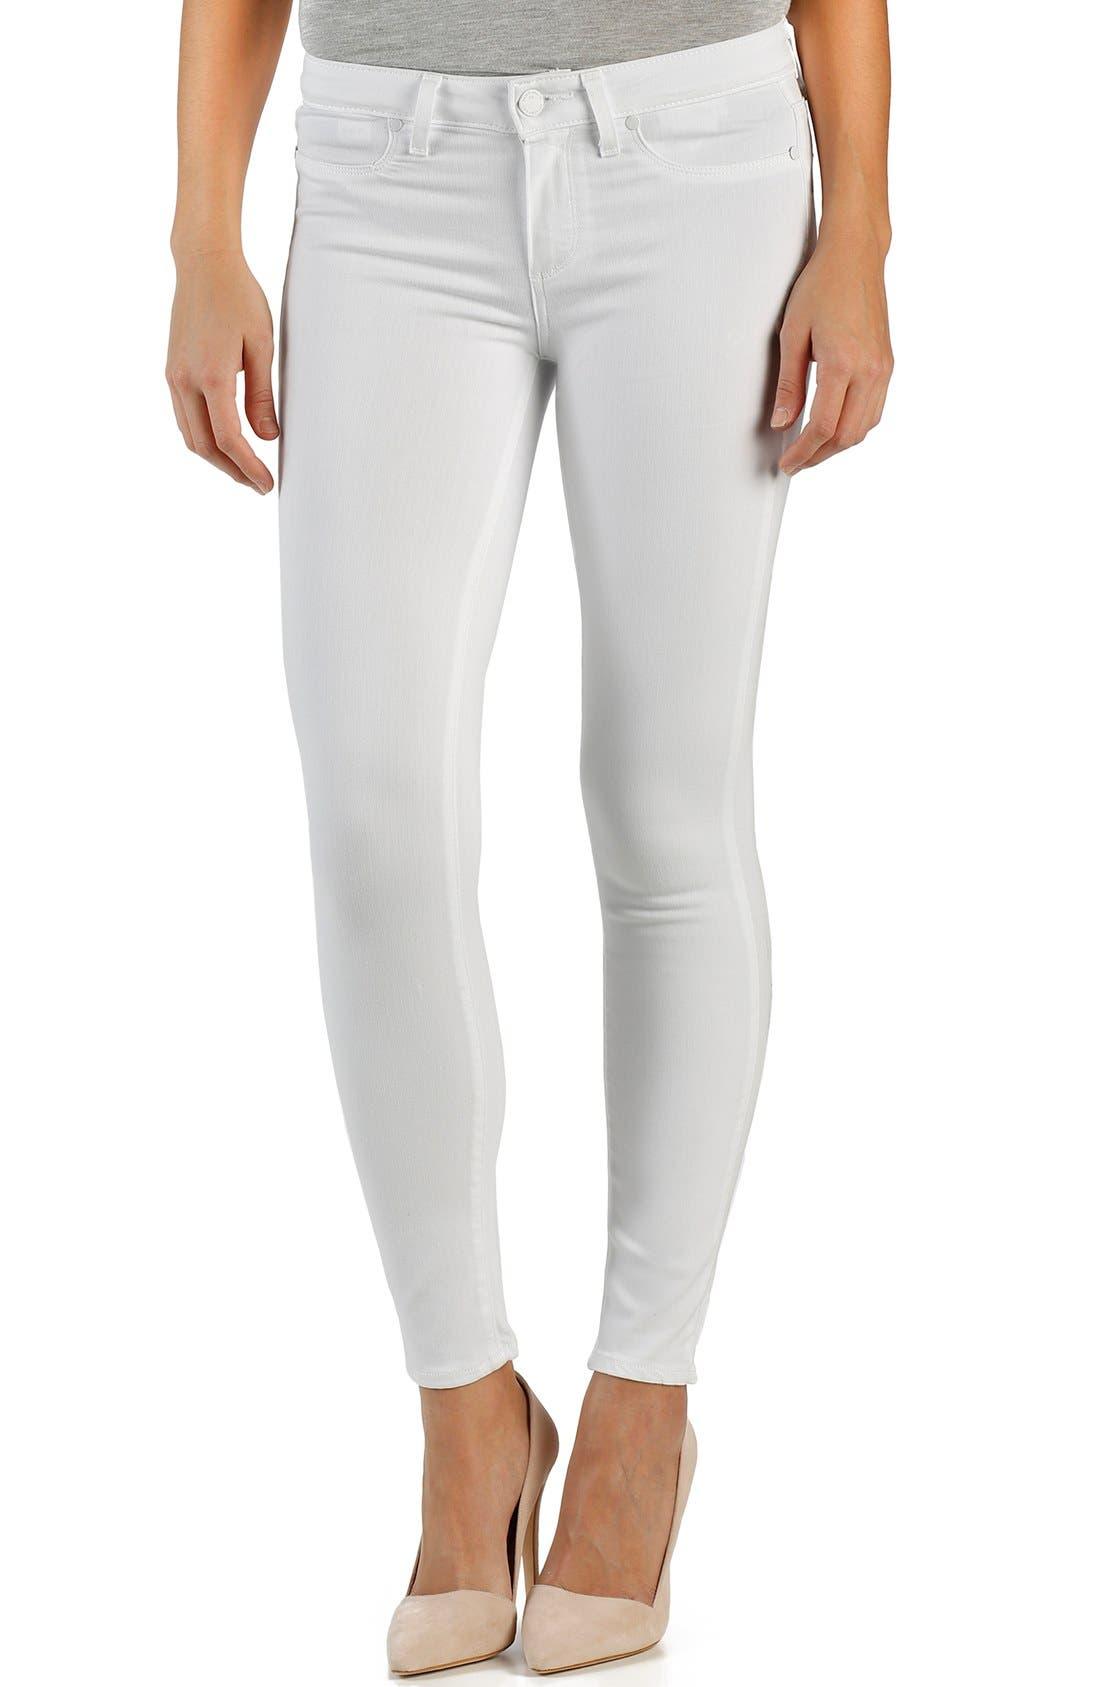 Alternate Image 1 Selected - Paige Denim 'Transcend - Verdugo' Ankle Skinny Jeans (White Mist)